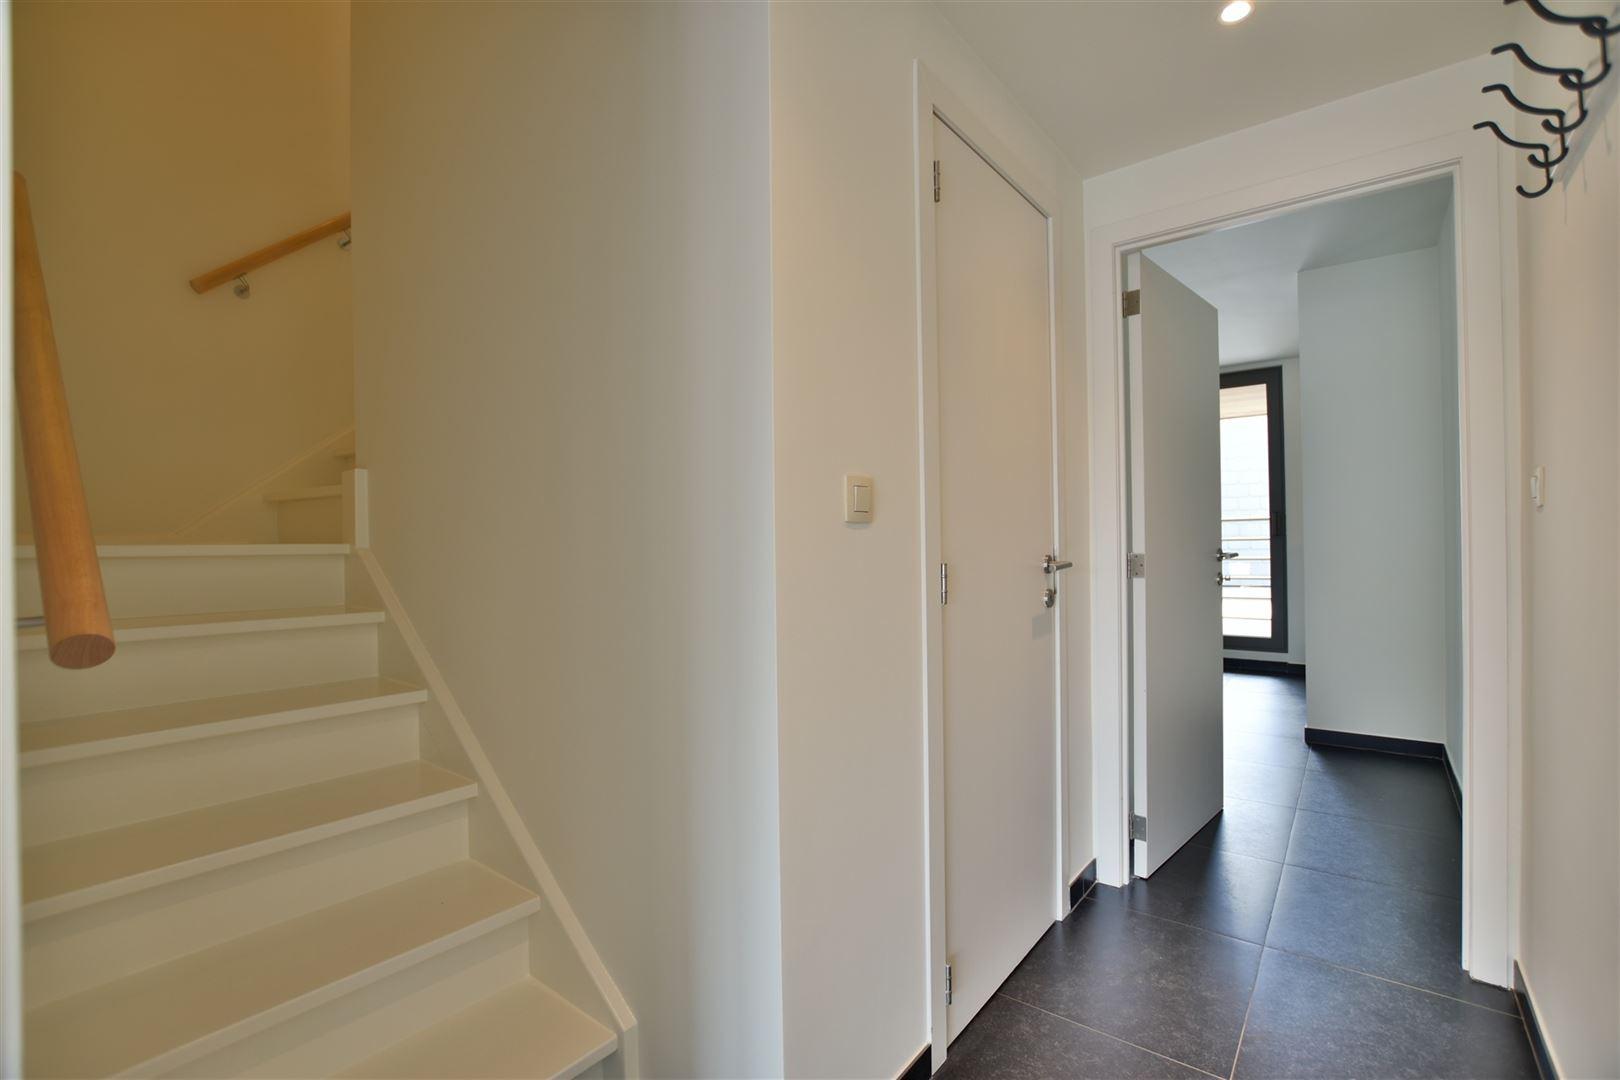 Foto 13 : Duplex/Penthouse te 9200 Sint-Gillis-bij-Dendermonde (België) - Prijs € 278.000